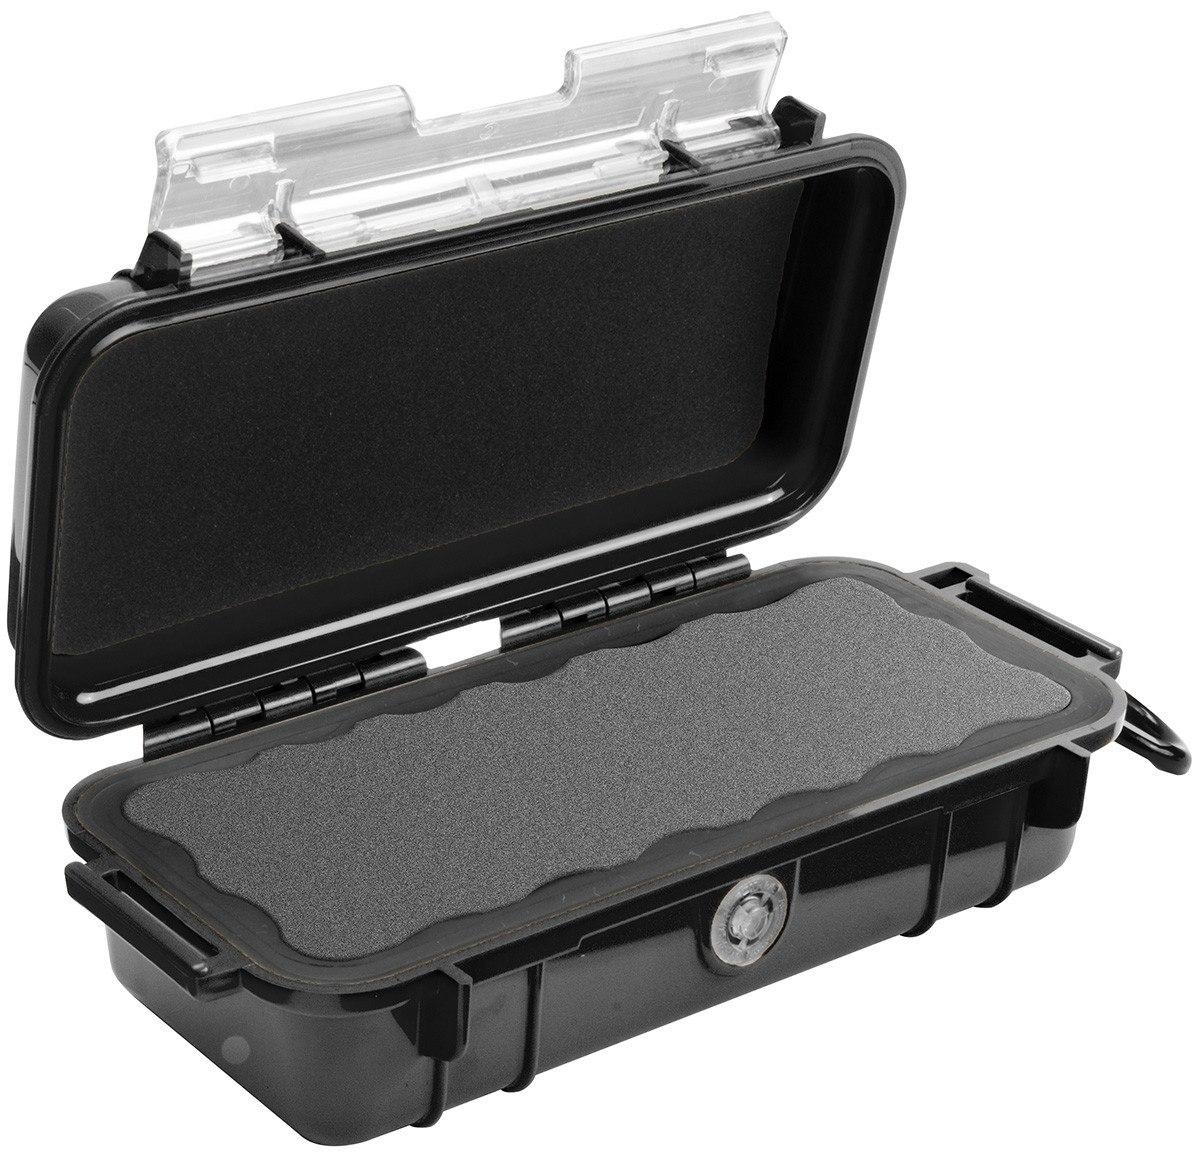 Pelican Micro Case 1030 Carrying Case Camera, Cellular Phone - Black